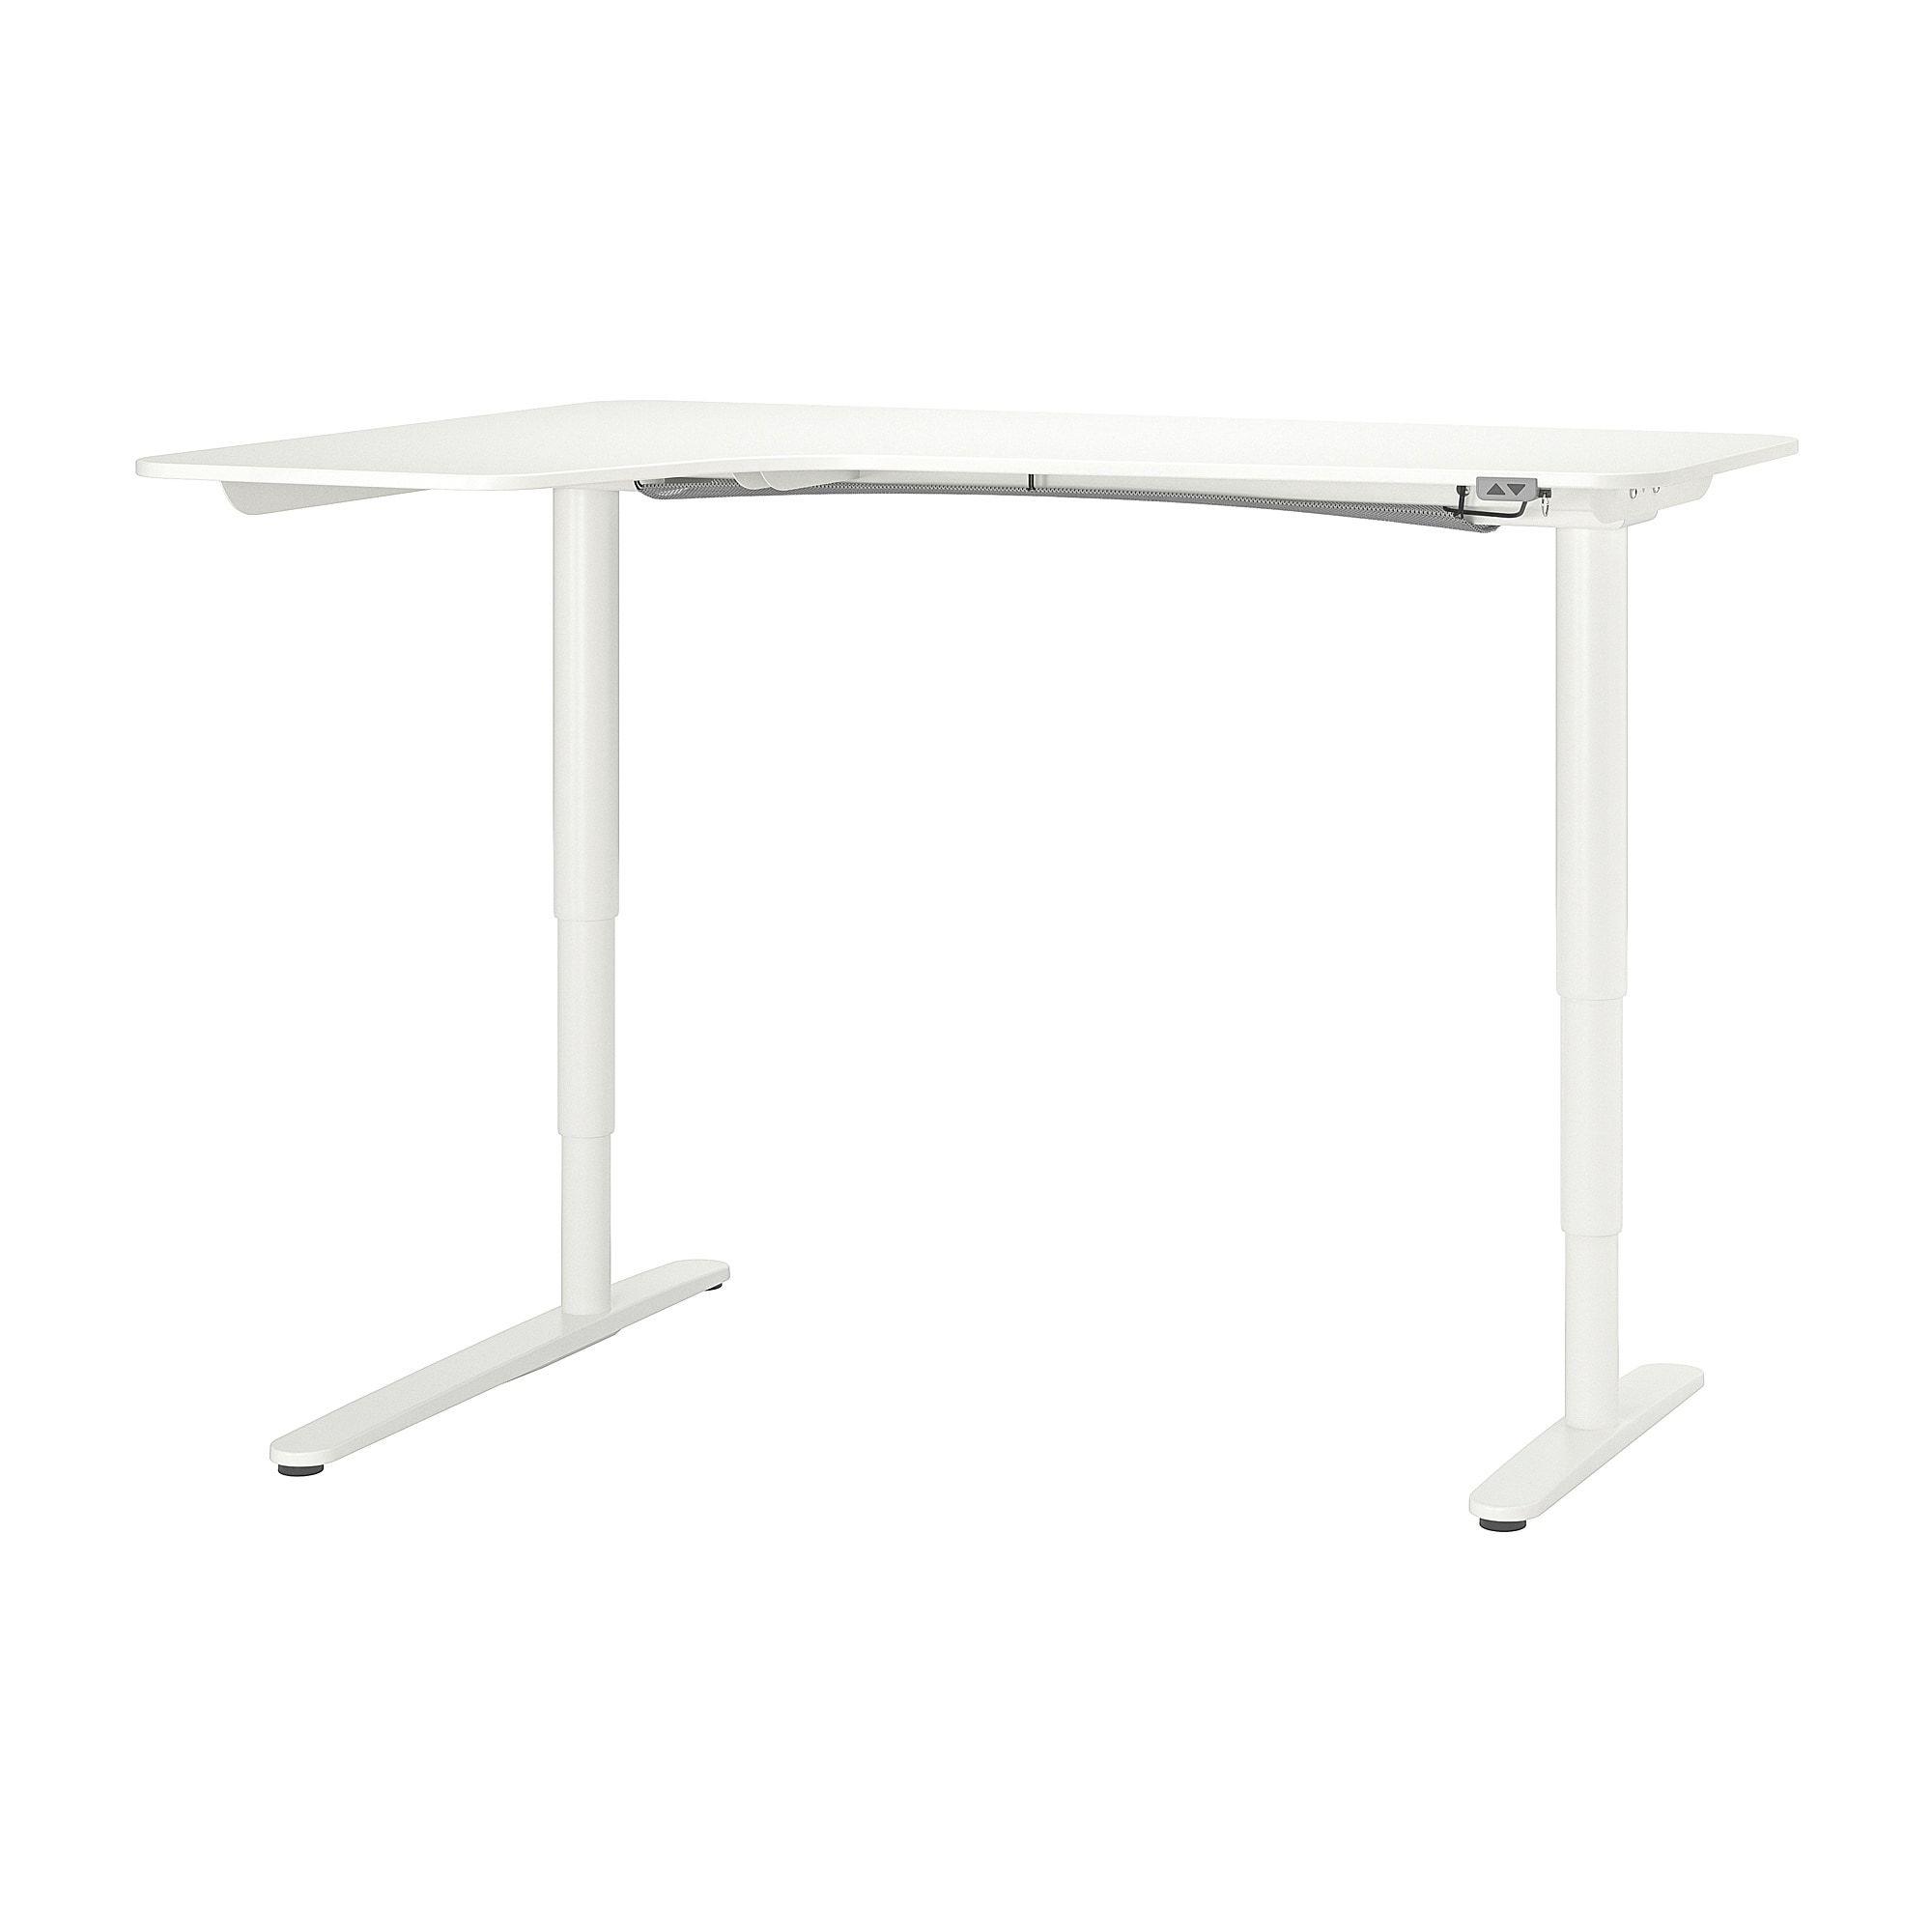 Ikea Bekant White Corner Desk Left Sit Stand Corner Desk White Corner Desk Ikea Bekant